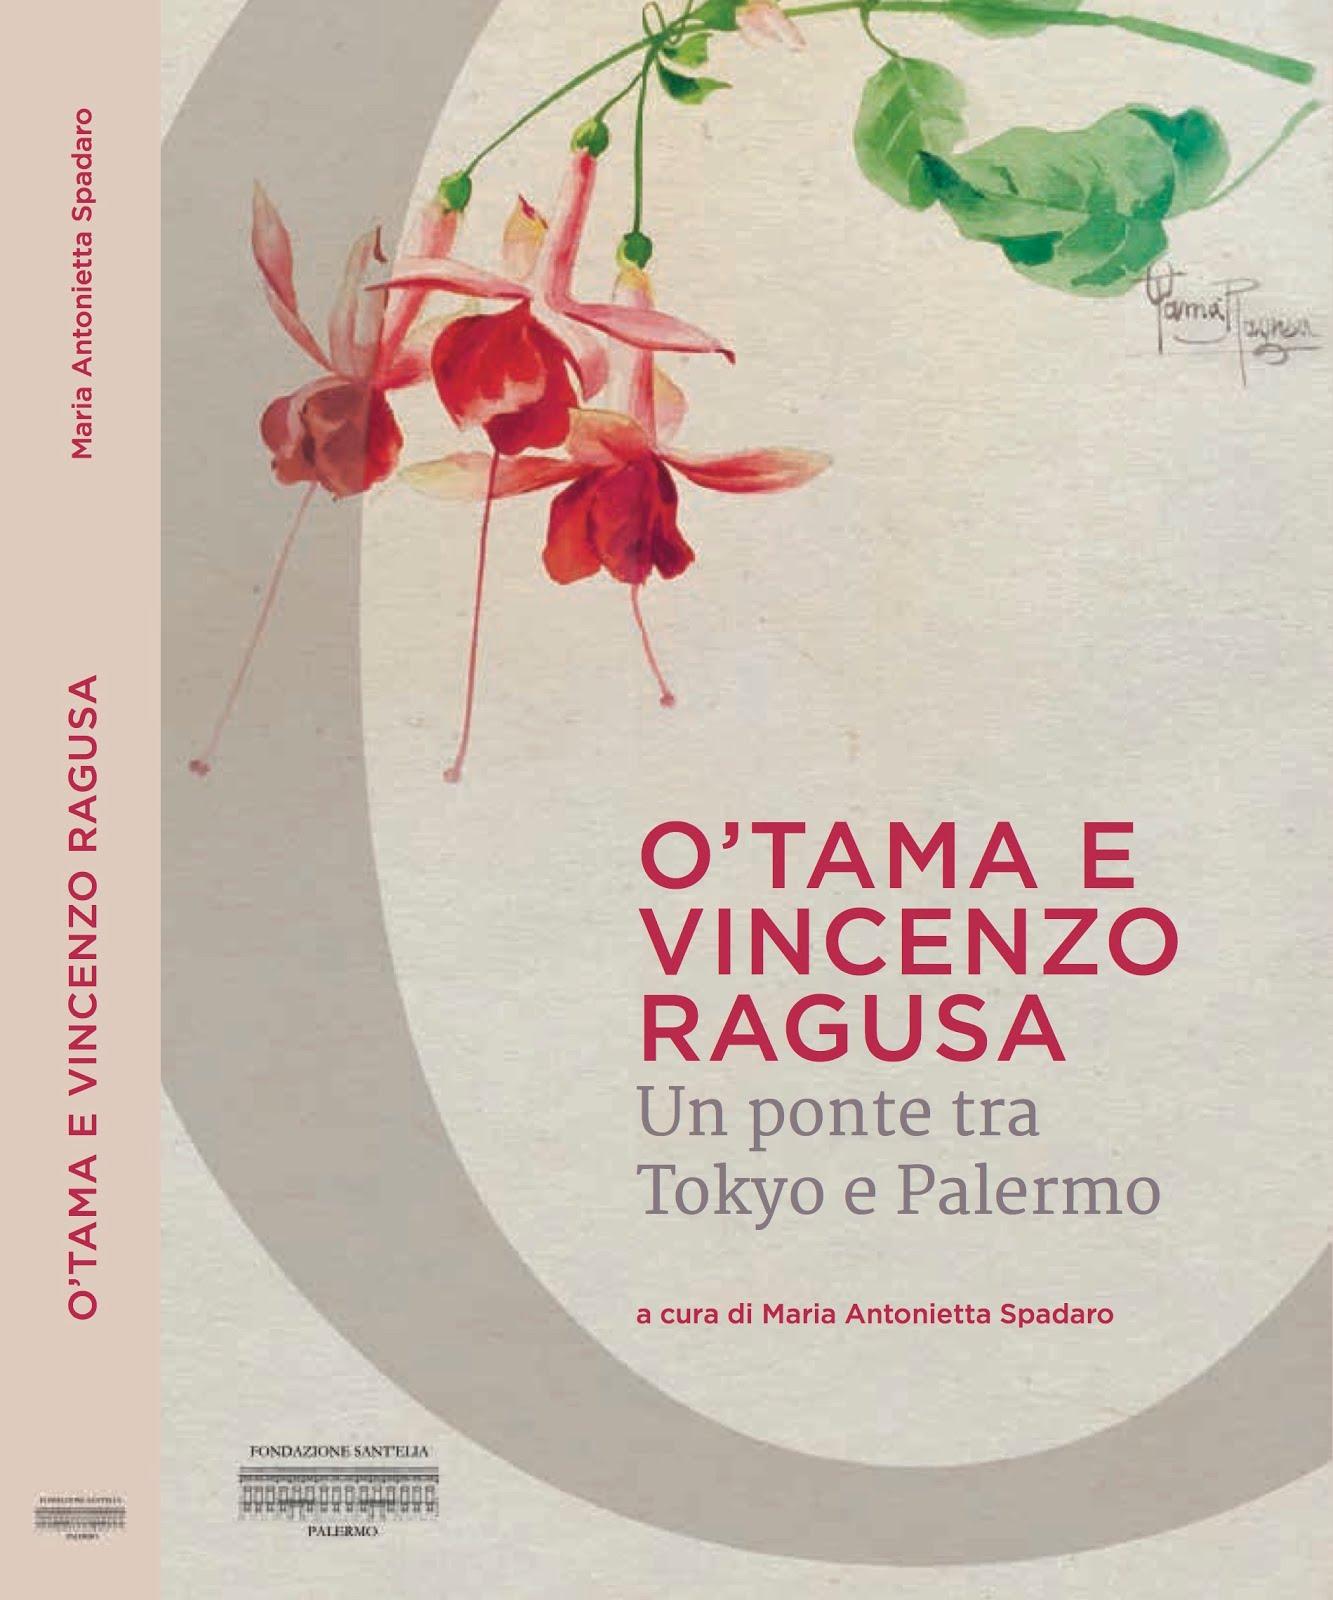 O'Tama e Vincenzo Ragusa. Un ponte tra Tokyo e Palermo